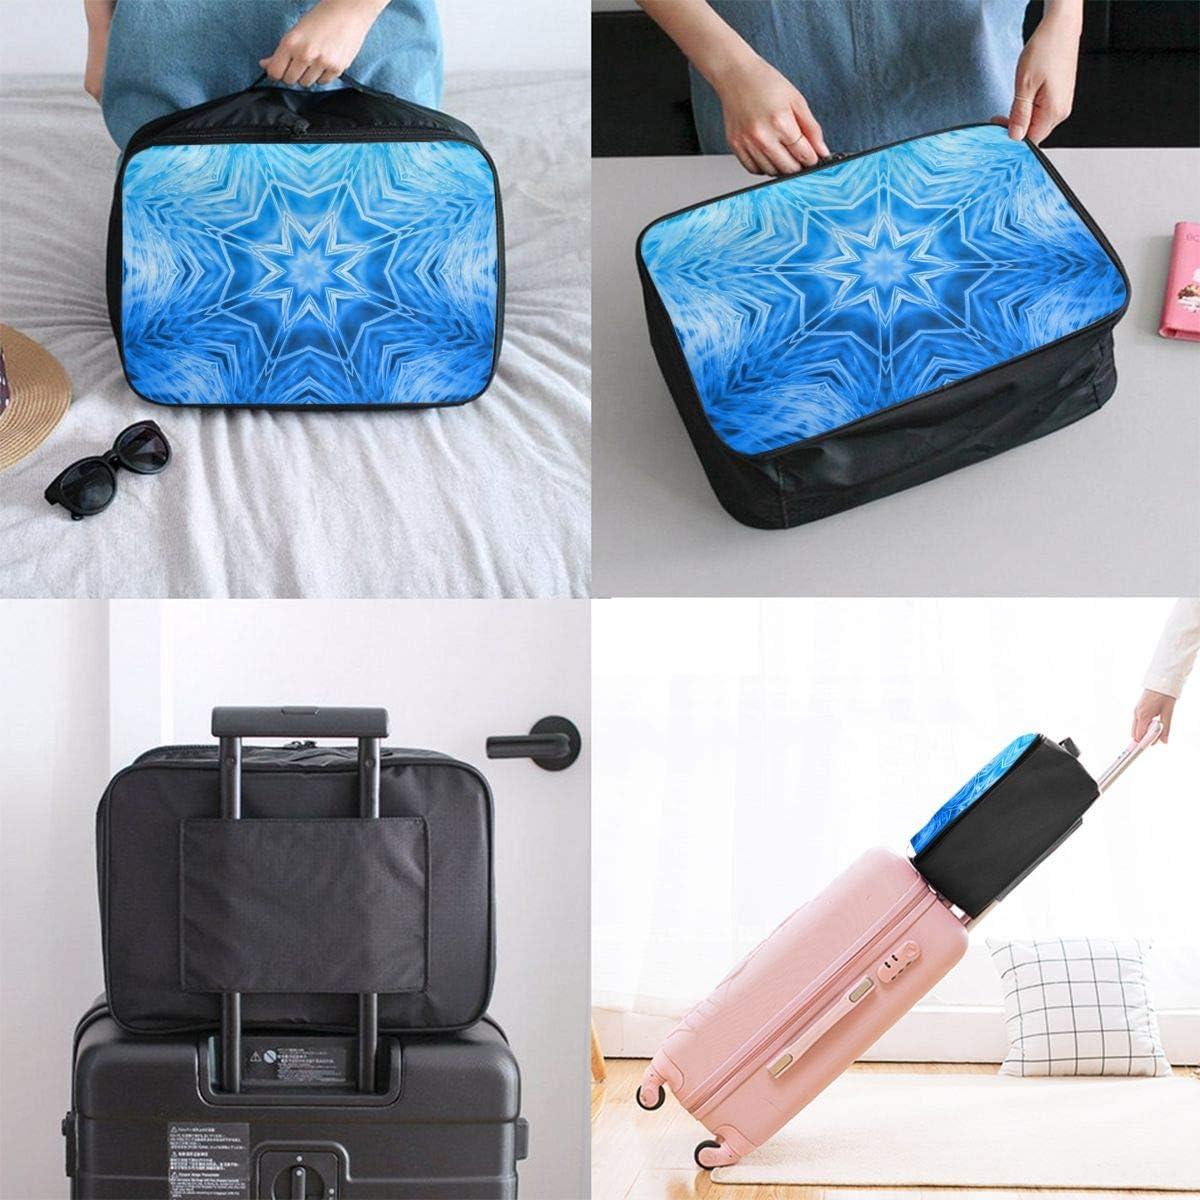 Mandala Travel Carry-on Luggage Weekender Bag Overnight Tote Flight Duffel In Trolley Handle